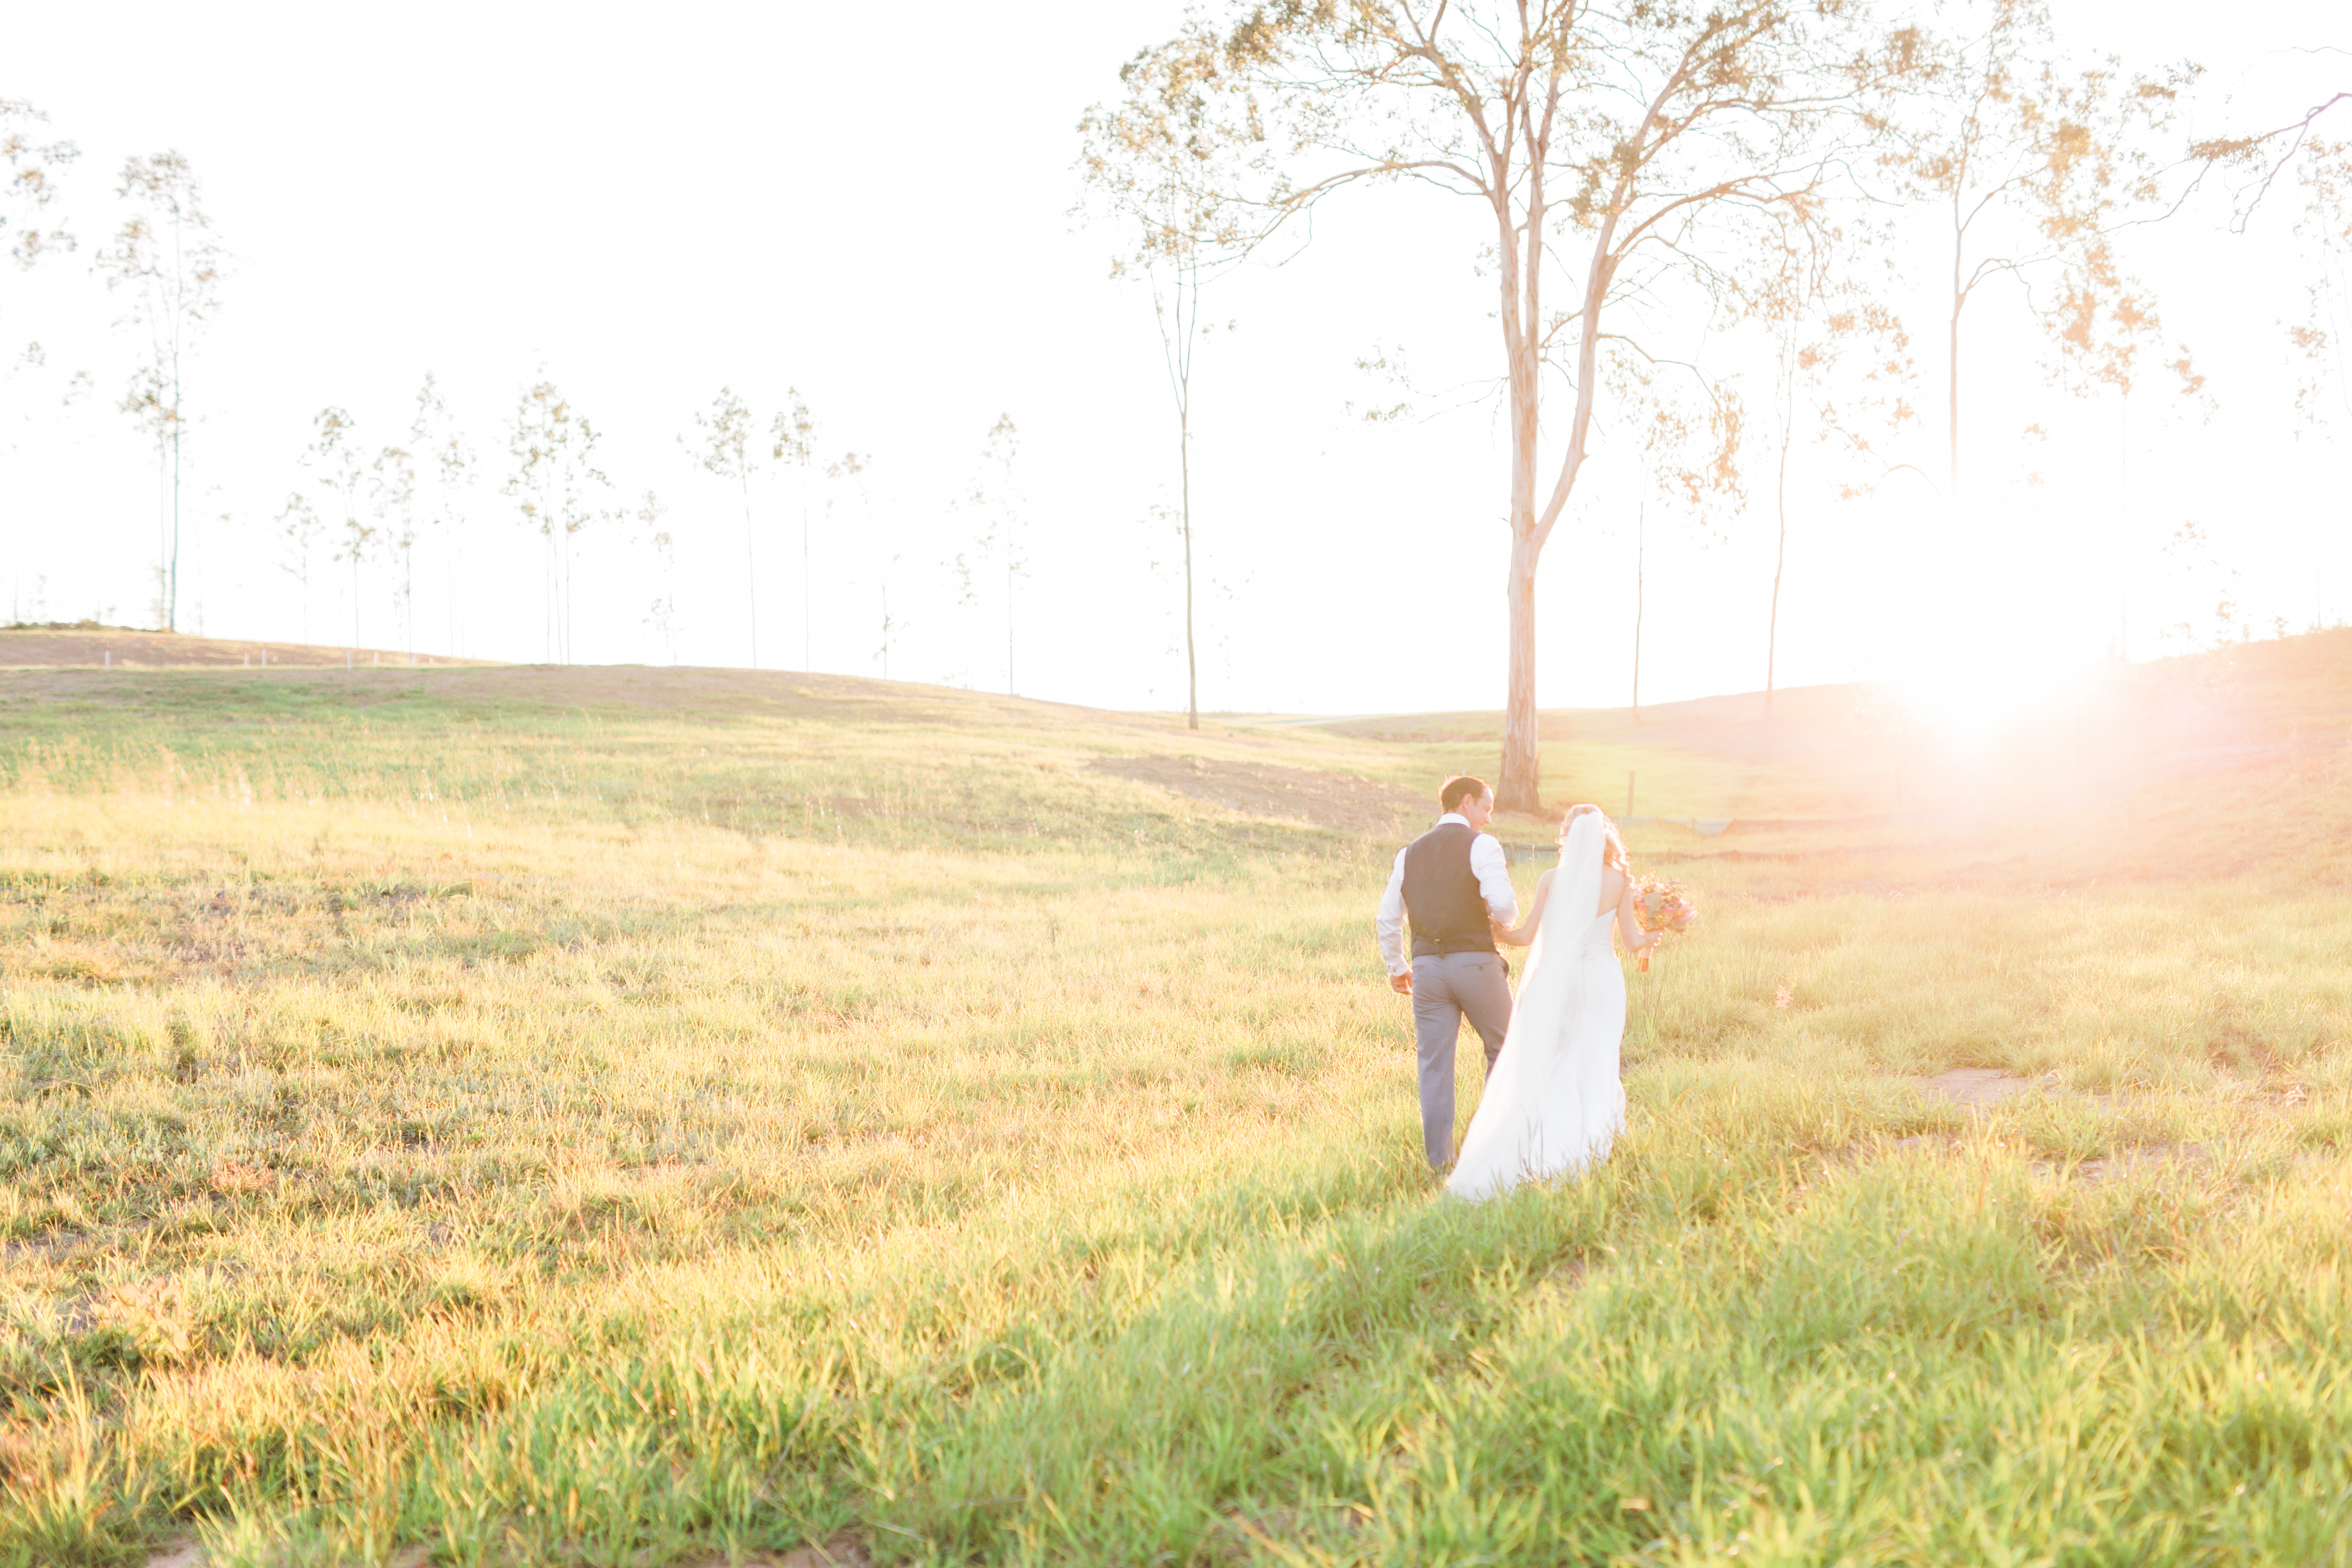 gold coast wedding, large marquee hire, wedding, tipi wedding, photography